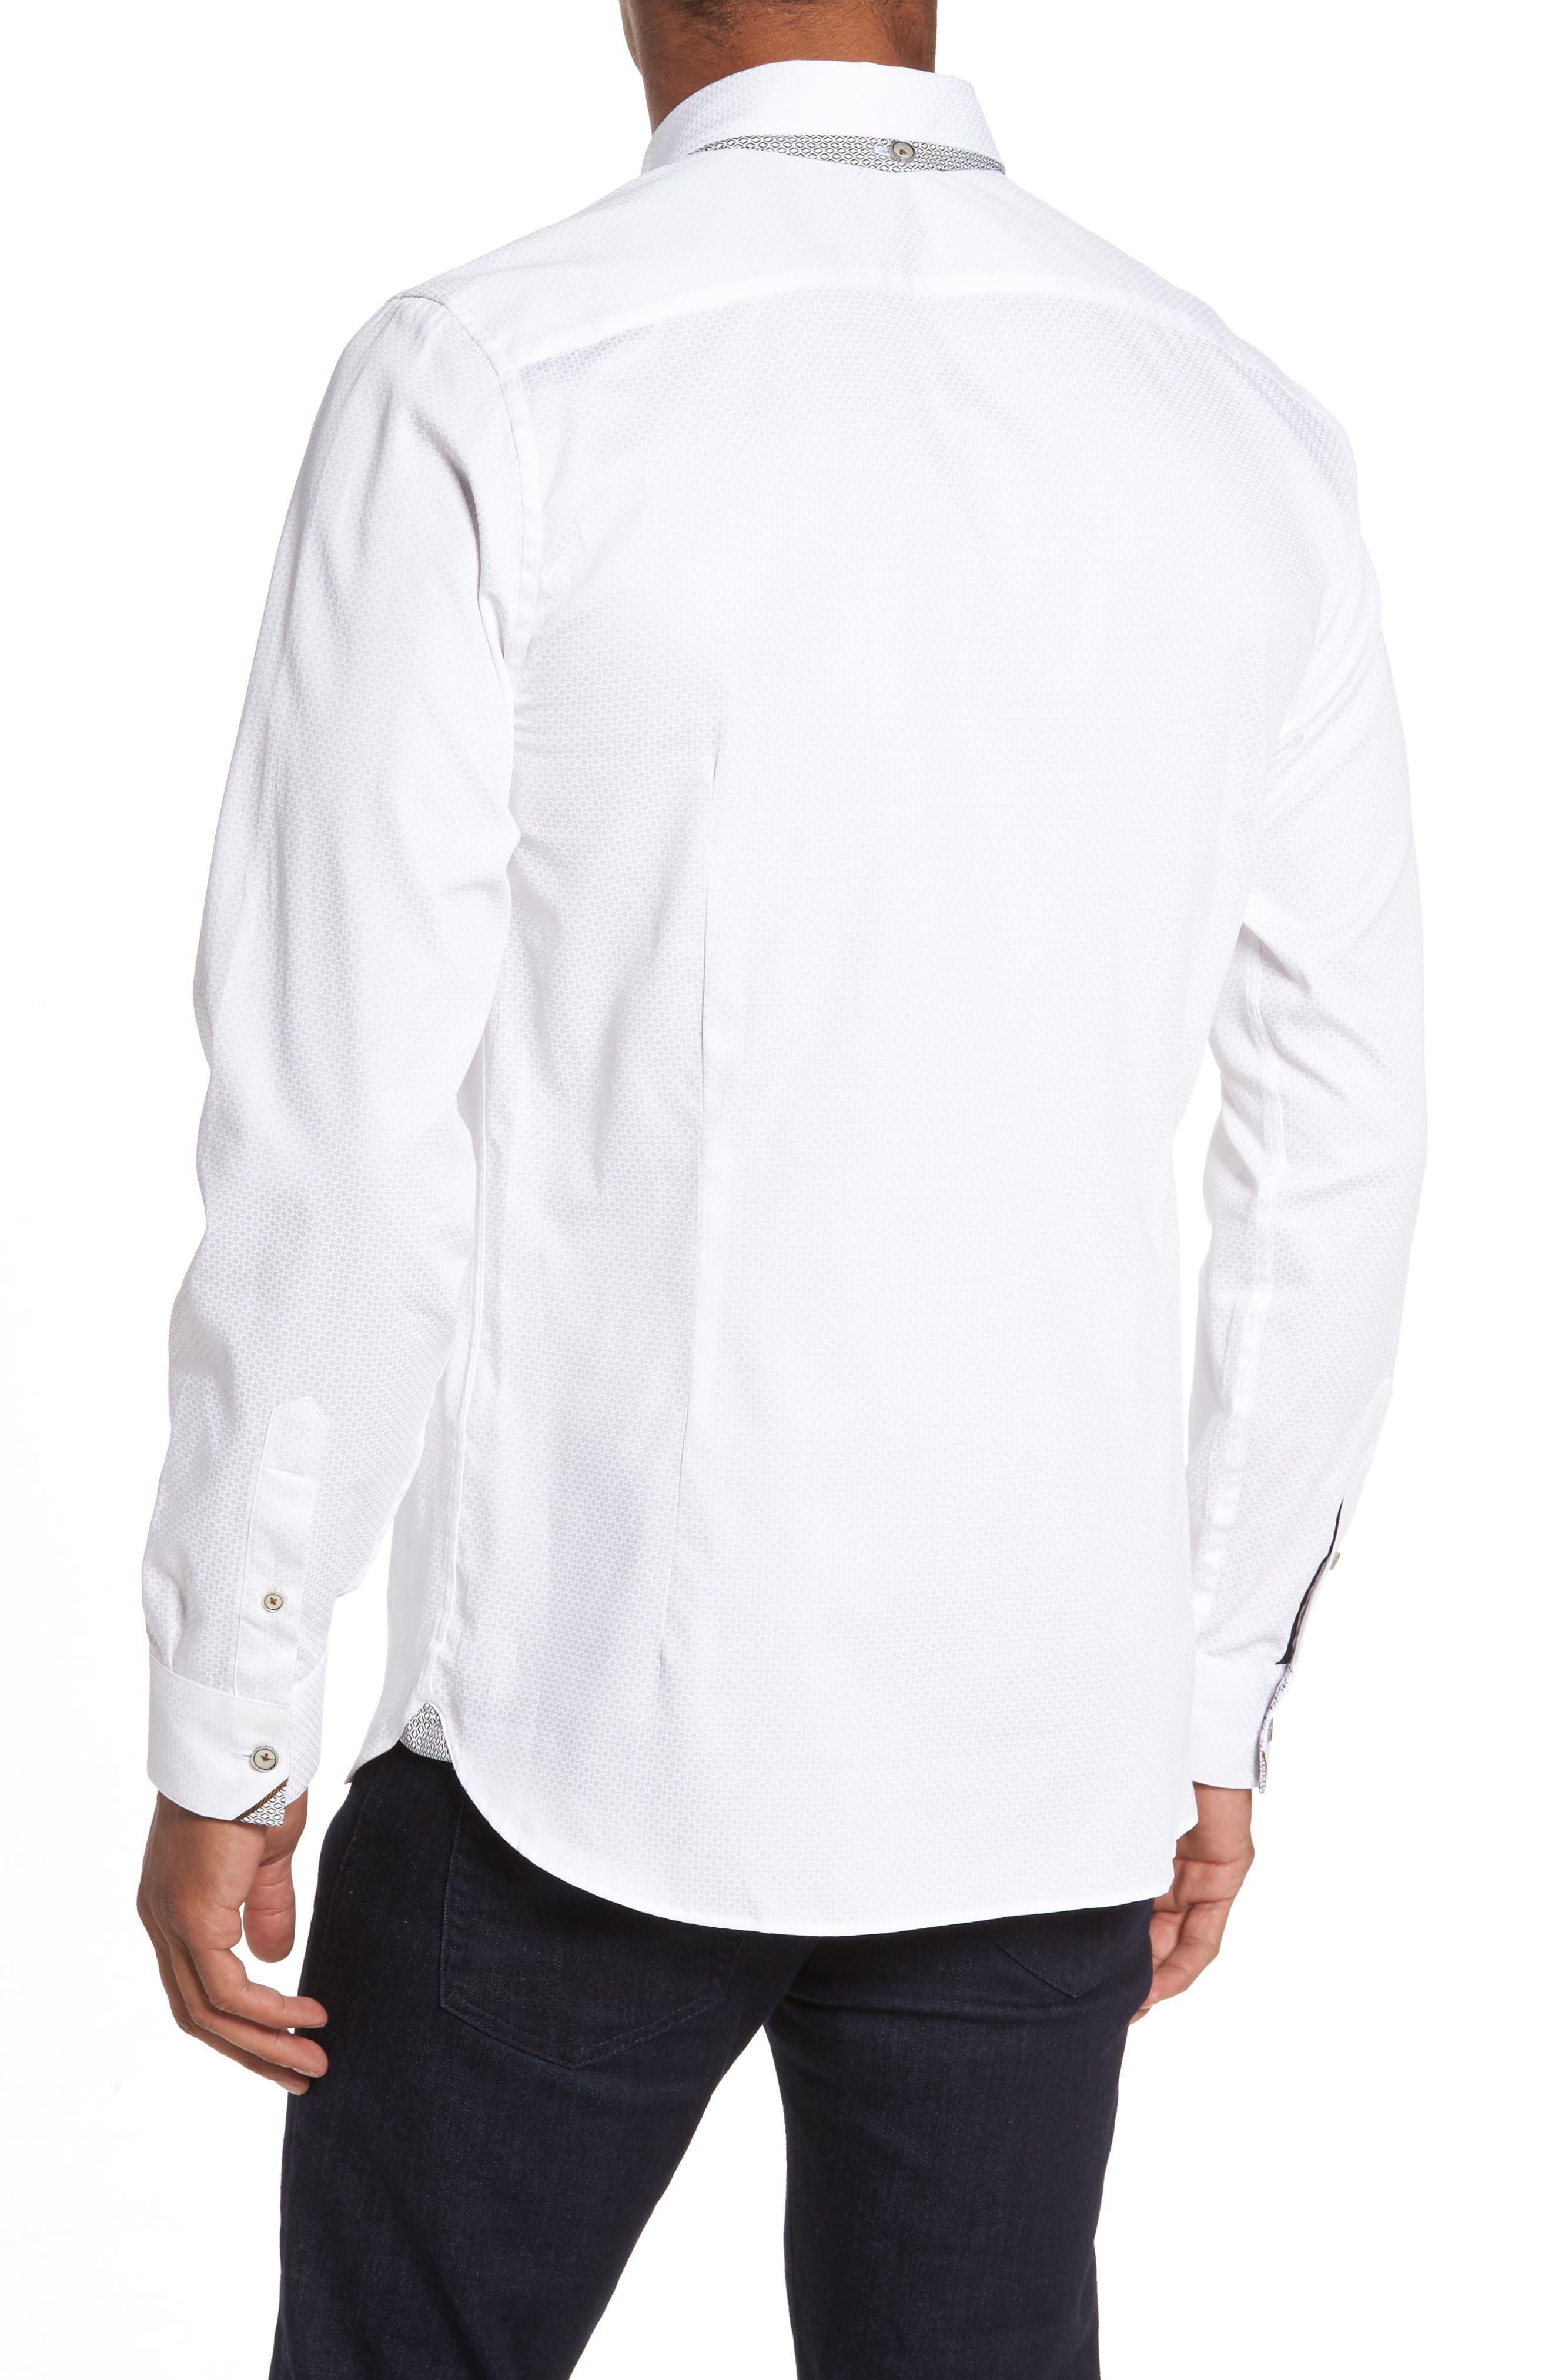 Strazbo Tonal Print Sport Shirt,                             Alternate thumbnail 2, color,                             White